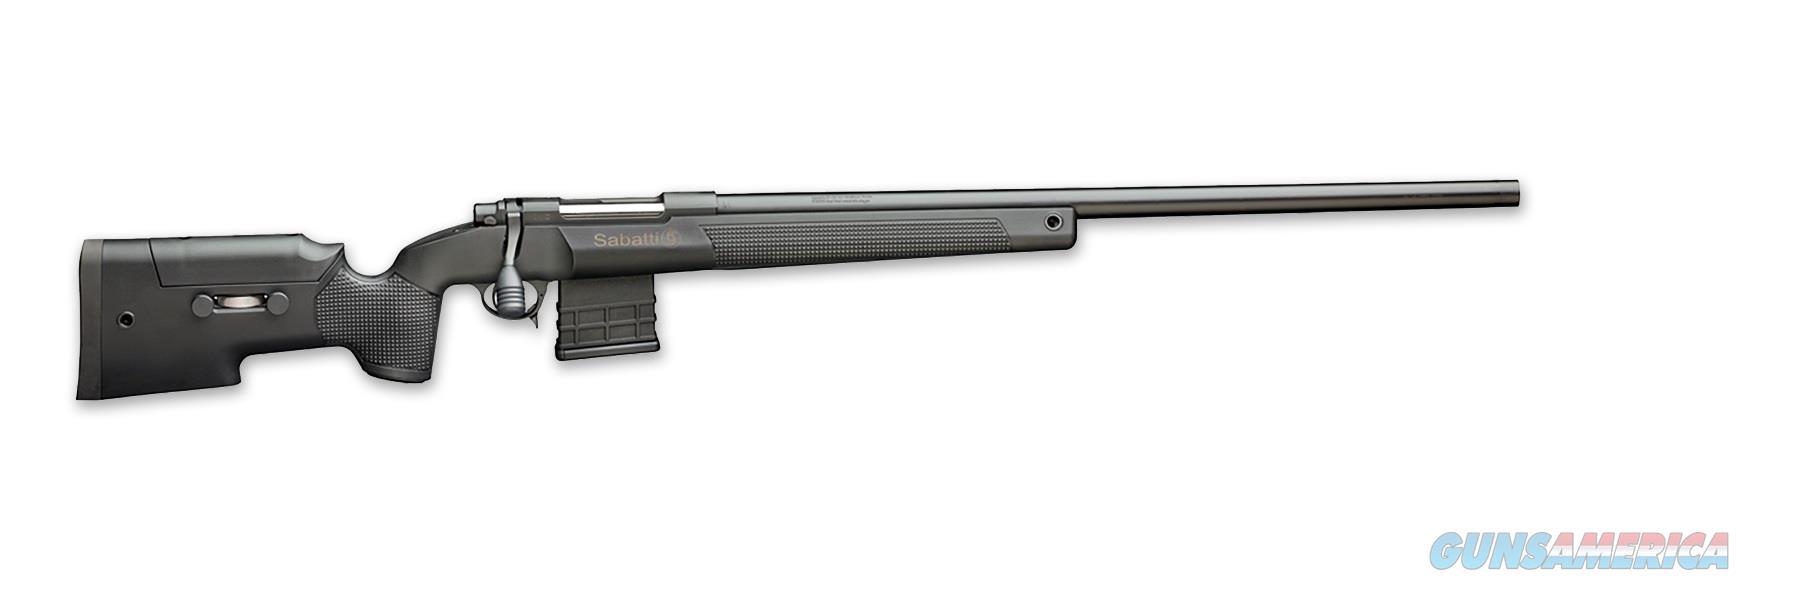 "Italian Firearms Group Sabatti Tactical US Target Bolt 6.5 Creed 26"" TB 53679   Guns > Rifles > Sabatti Rifles"